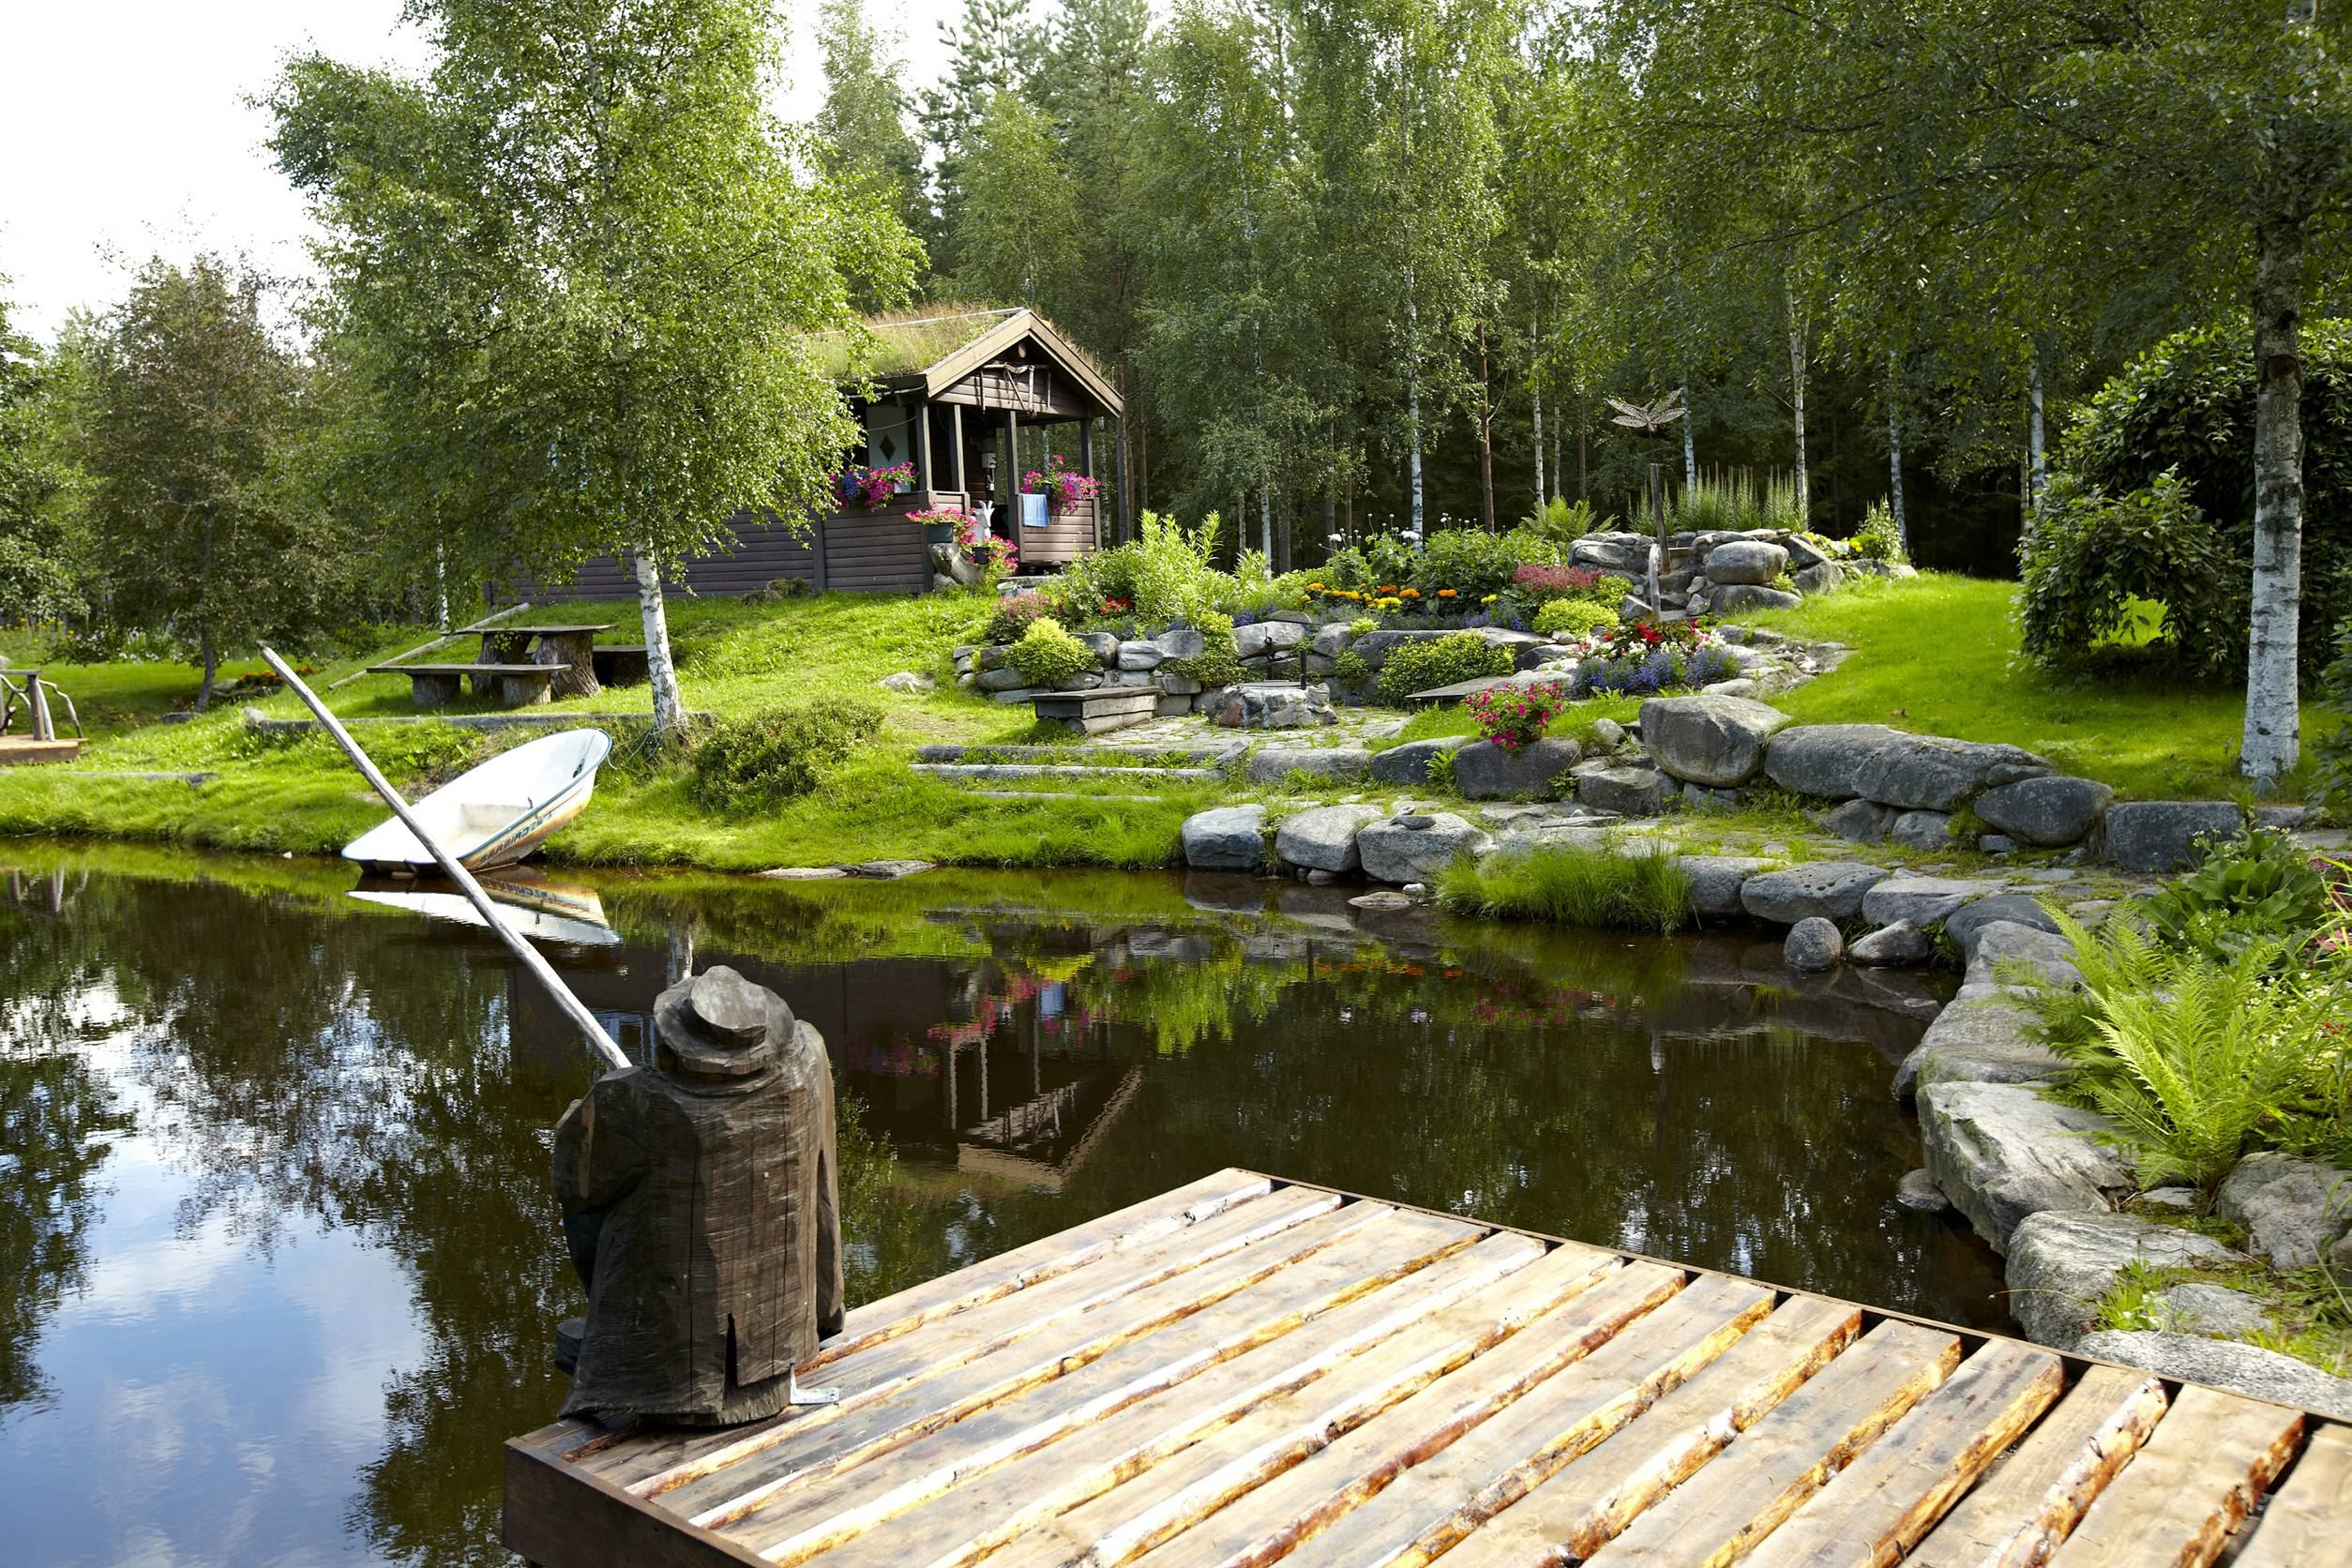 B&B/Vandrarhem Nybygget Nattvilan